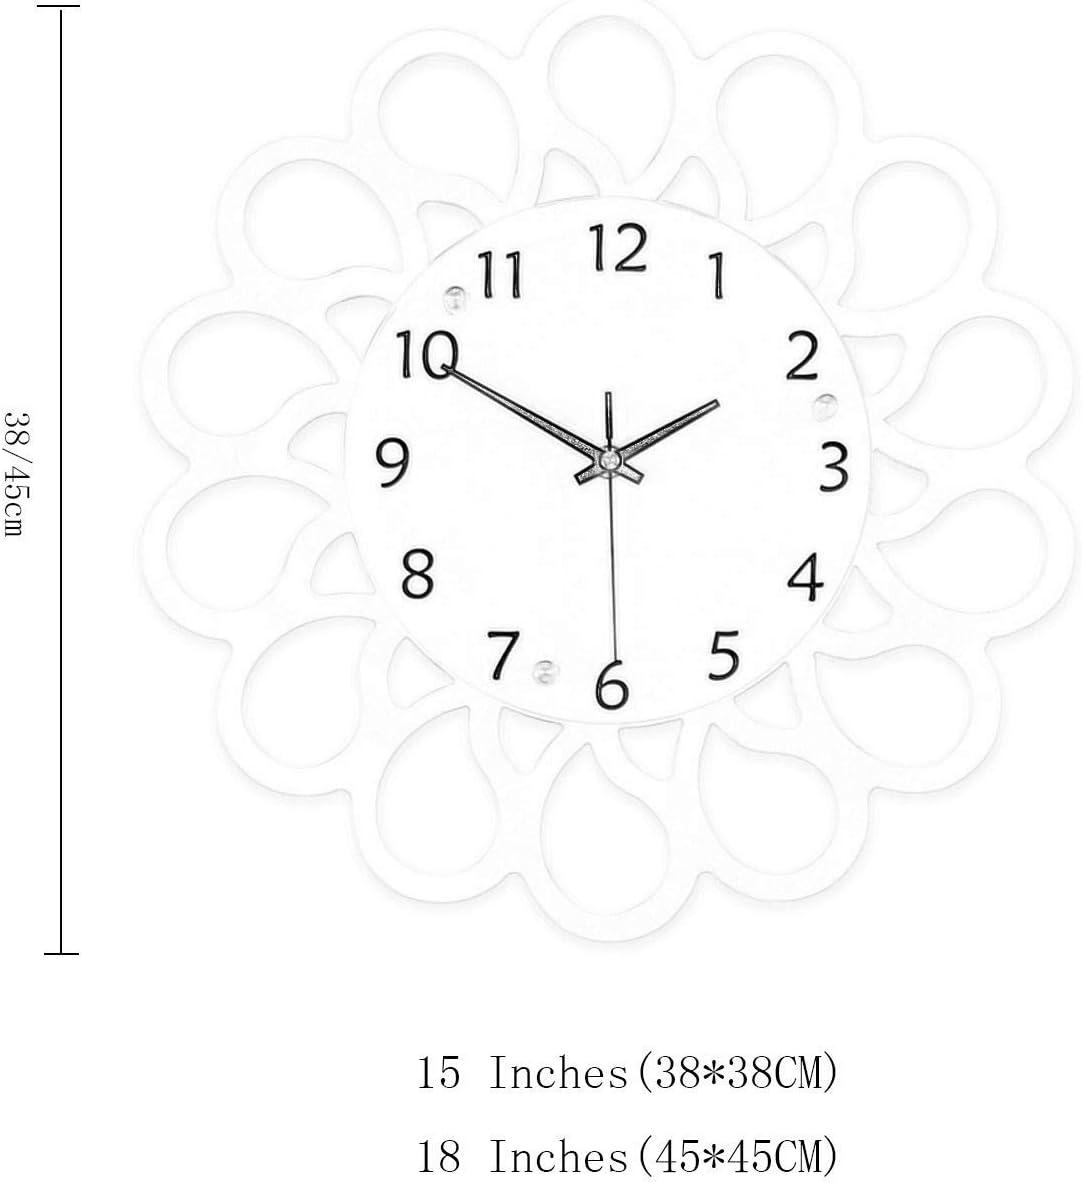 De Poméranie chien Horloge murale Creative Home horloge moderne minimaliste Art Horloge Murale